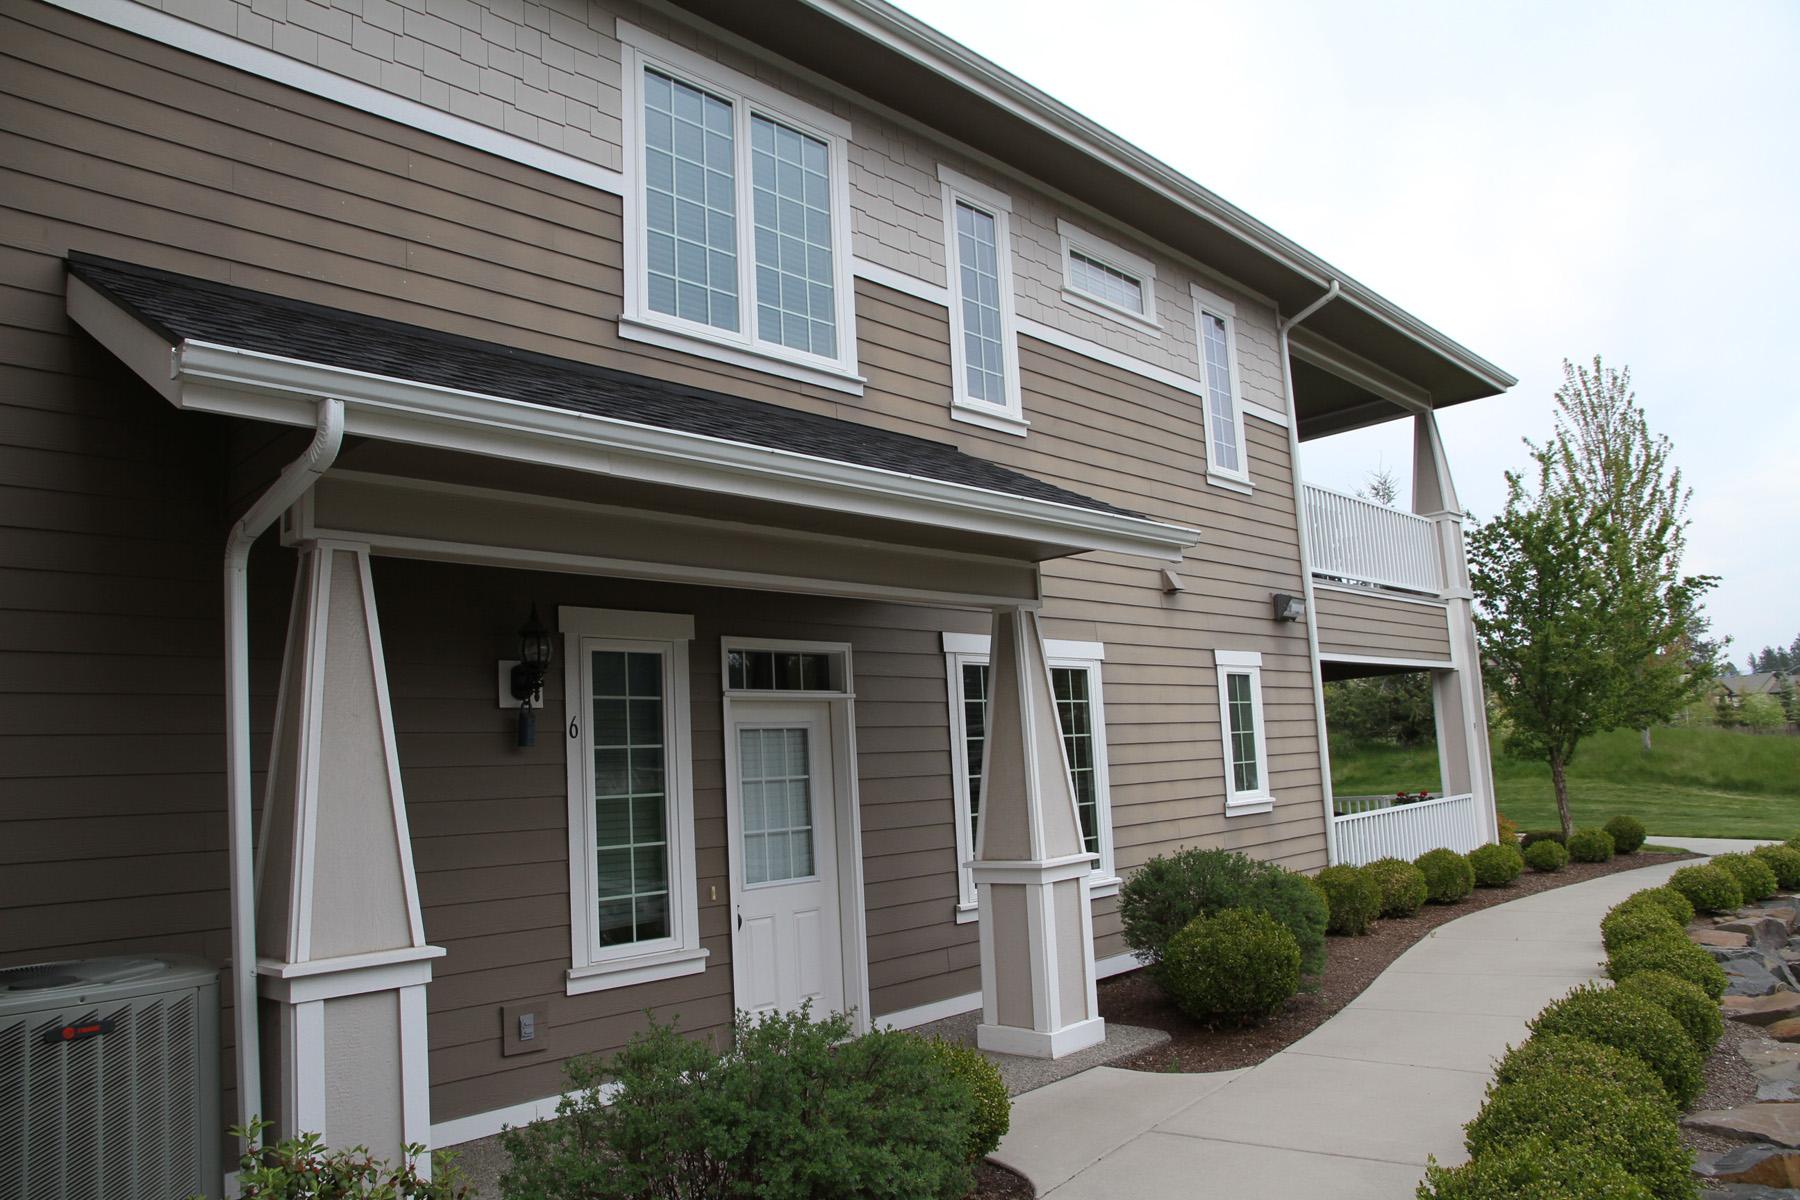 Condominio por un Venta en Penthouse Condo at Mill River 4465 W Greenchain Coeur D Alene, Idaho 83814 Estados Unidos